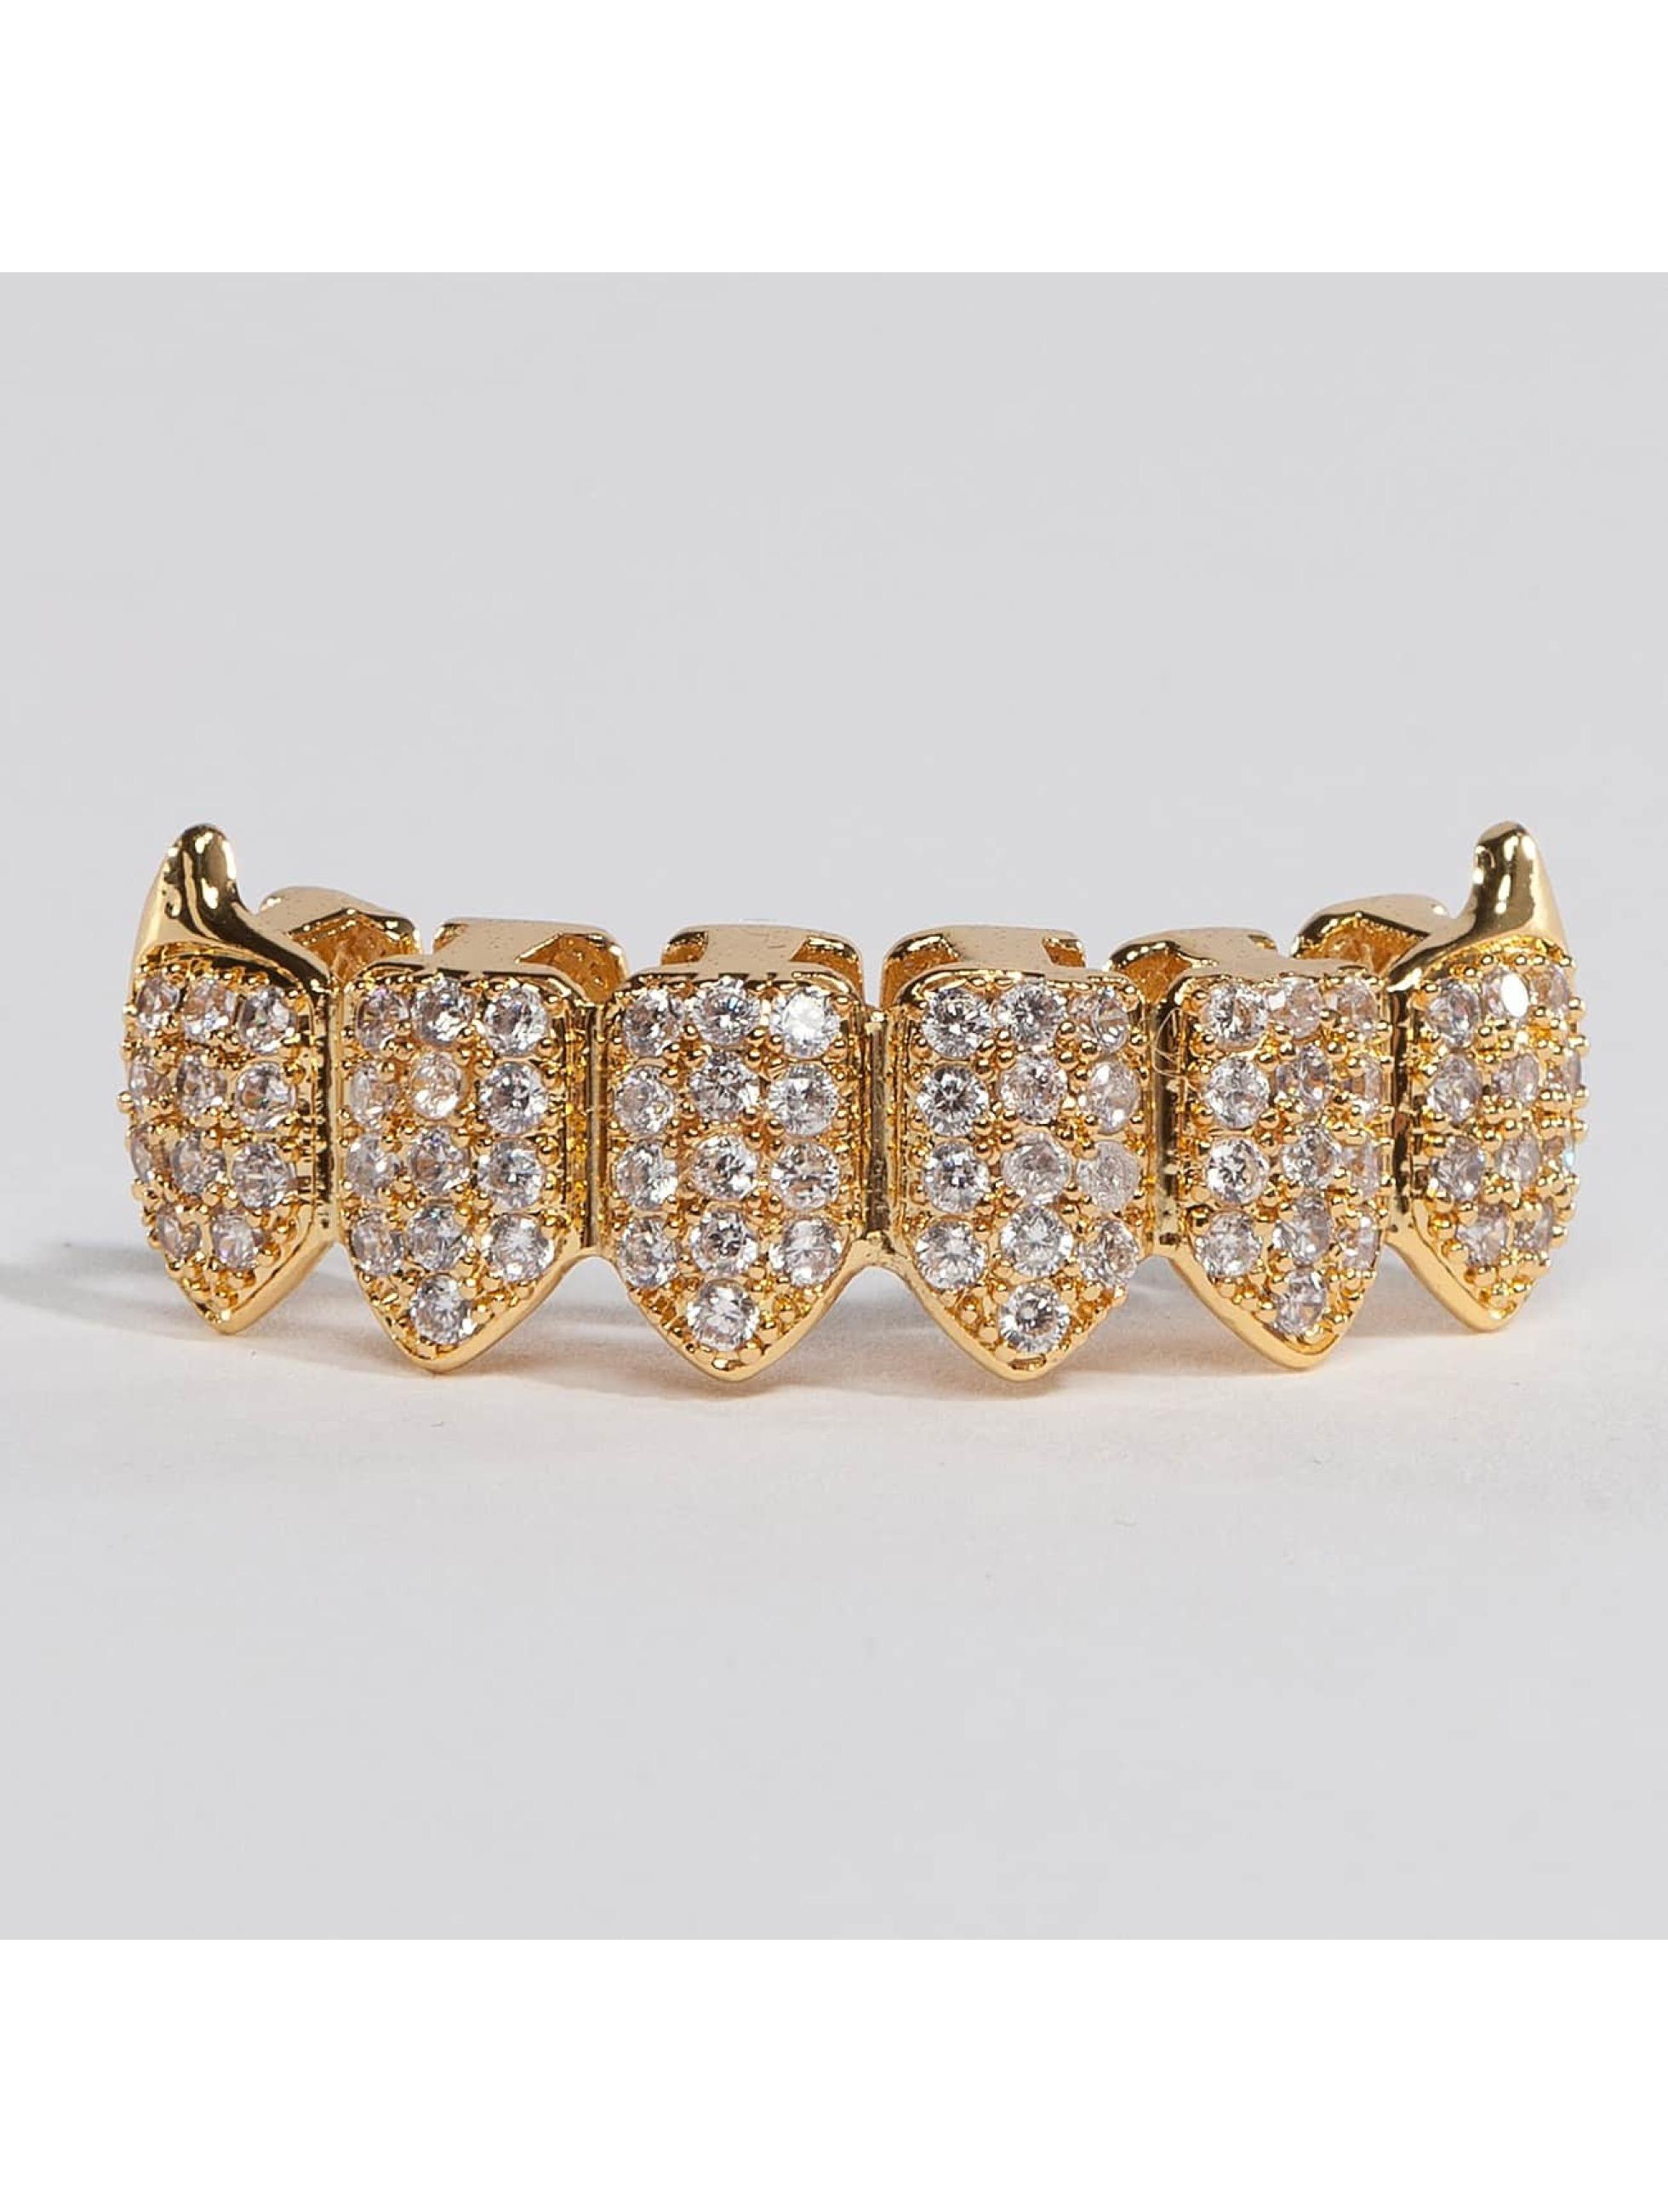 KING ICE Overige Gold_Plated CZ Dracula Teeth Bottom goud